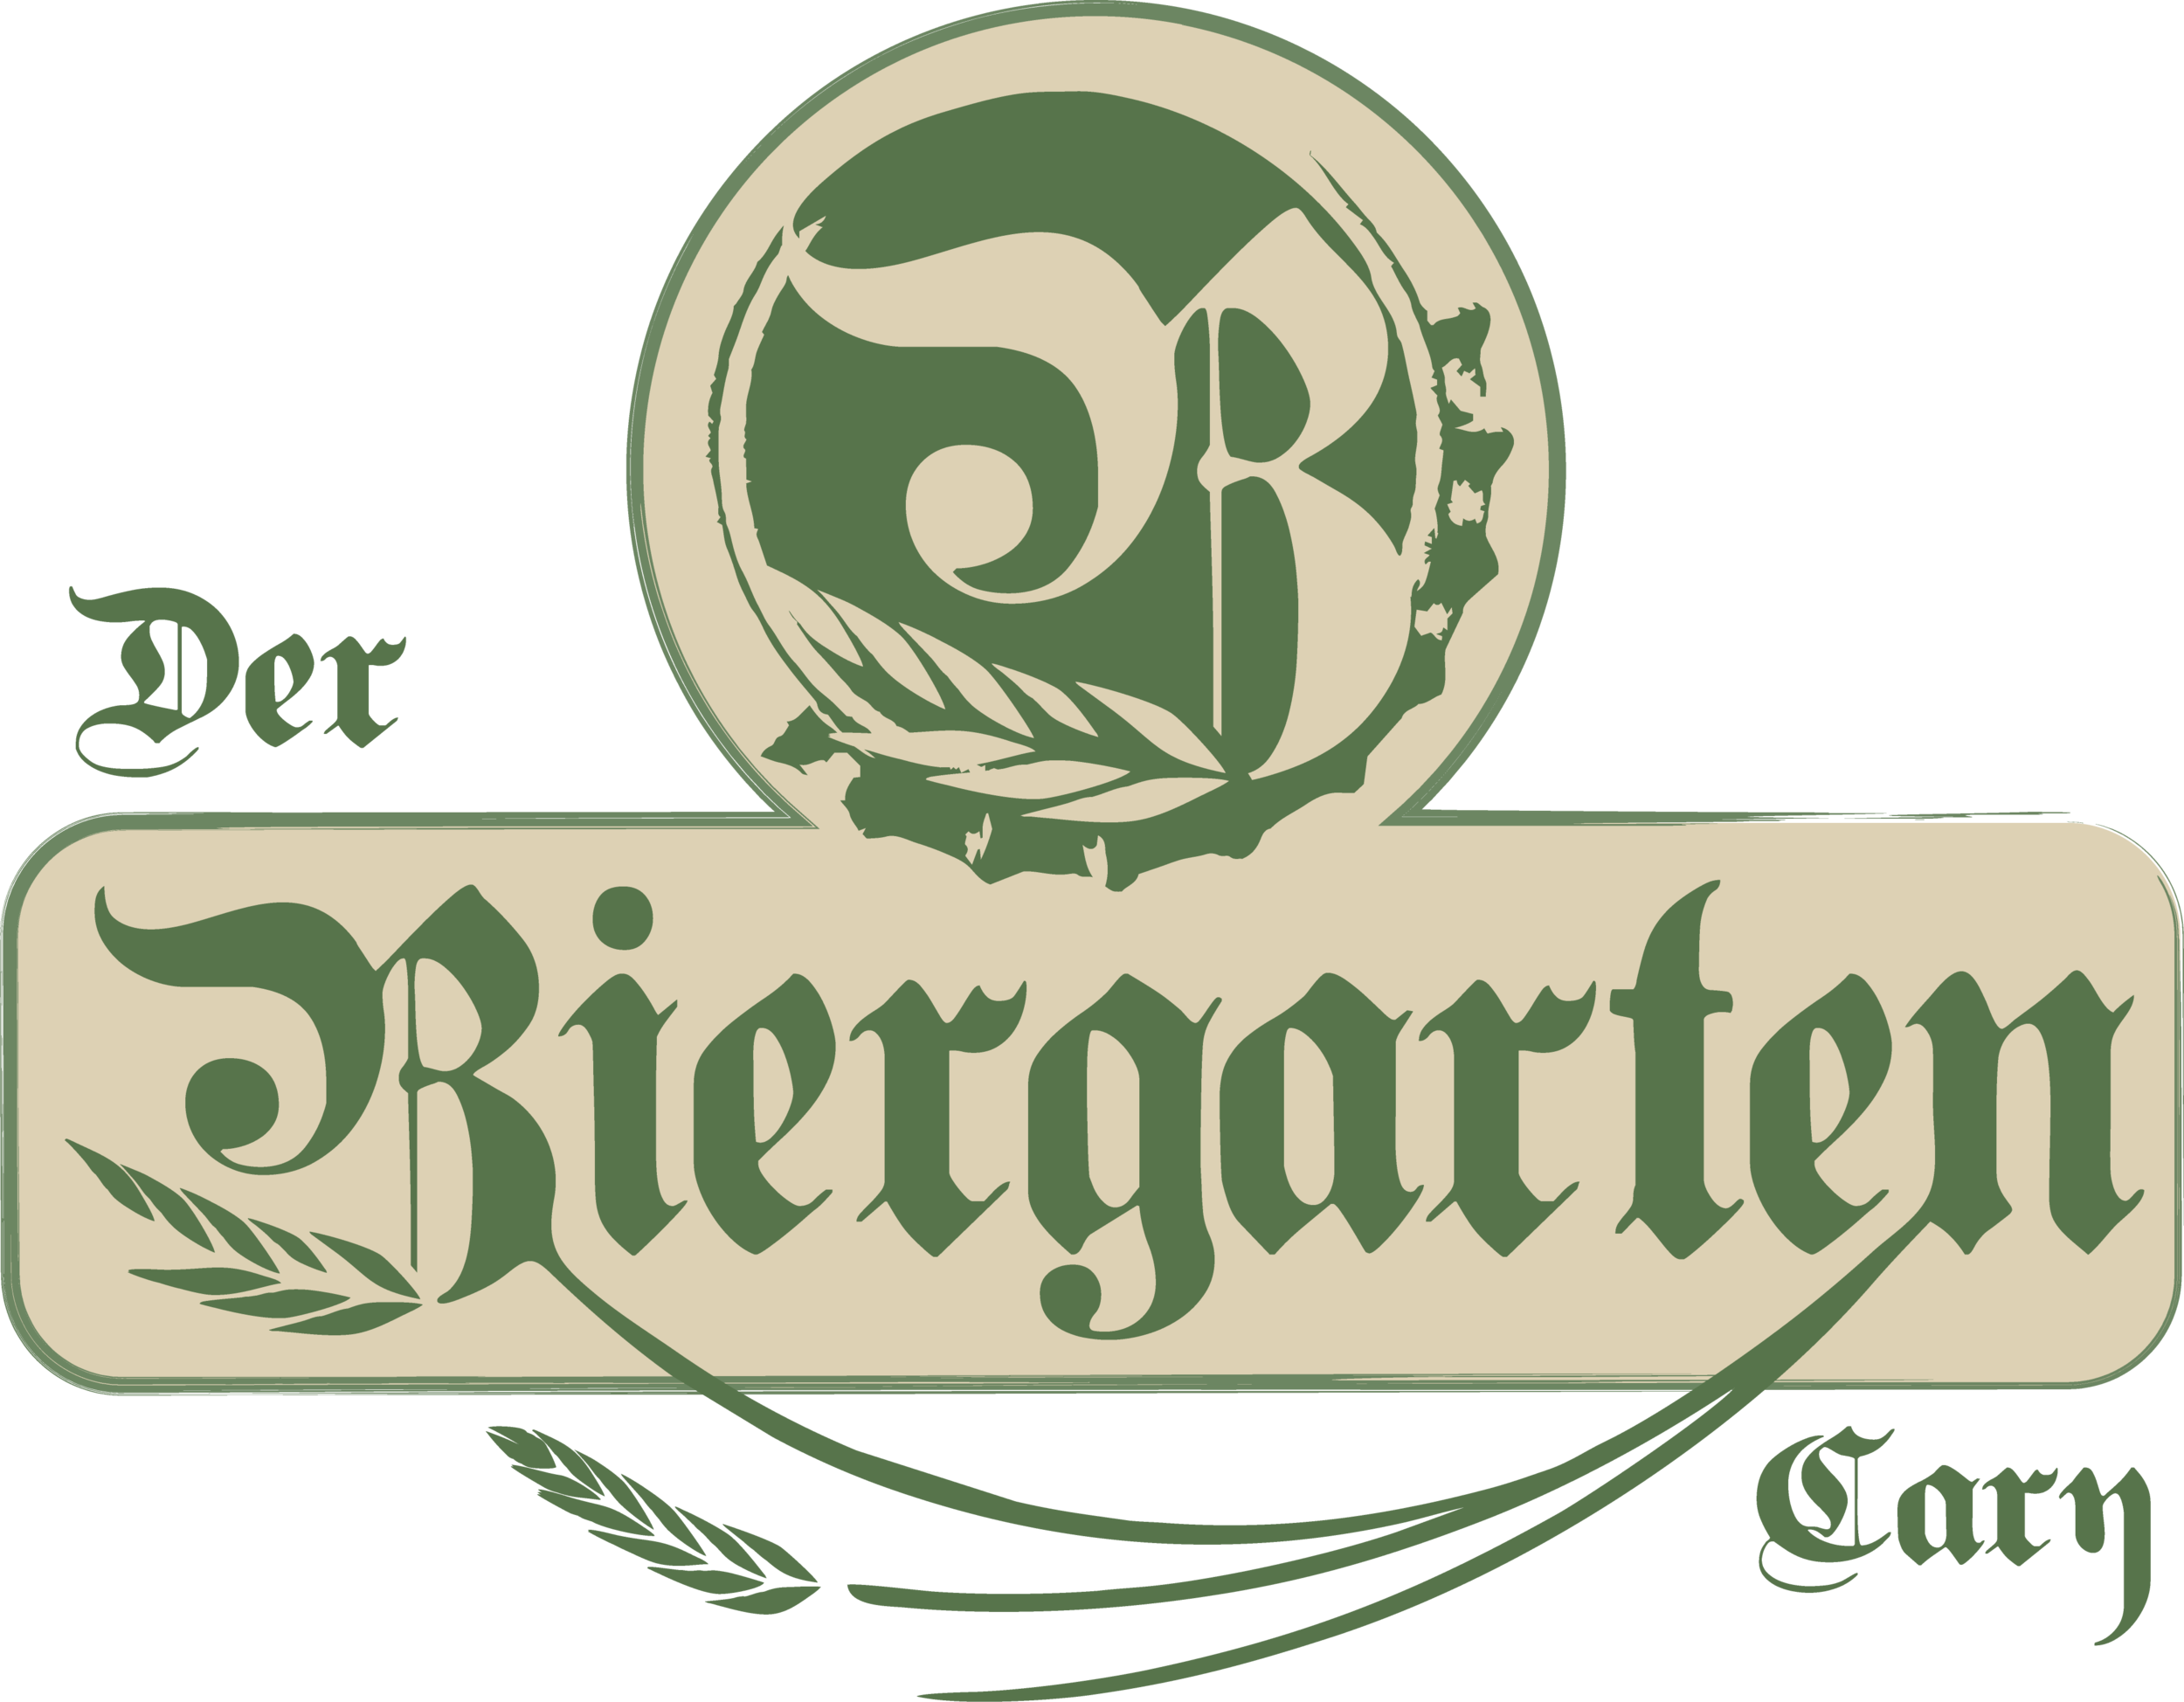 DER BIERGARTEN, CARY